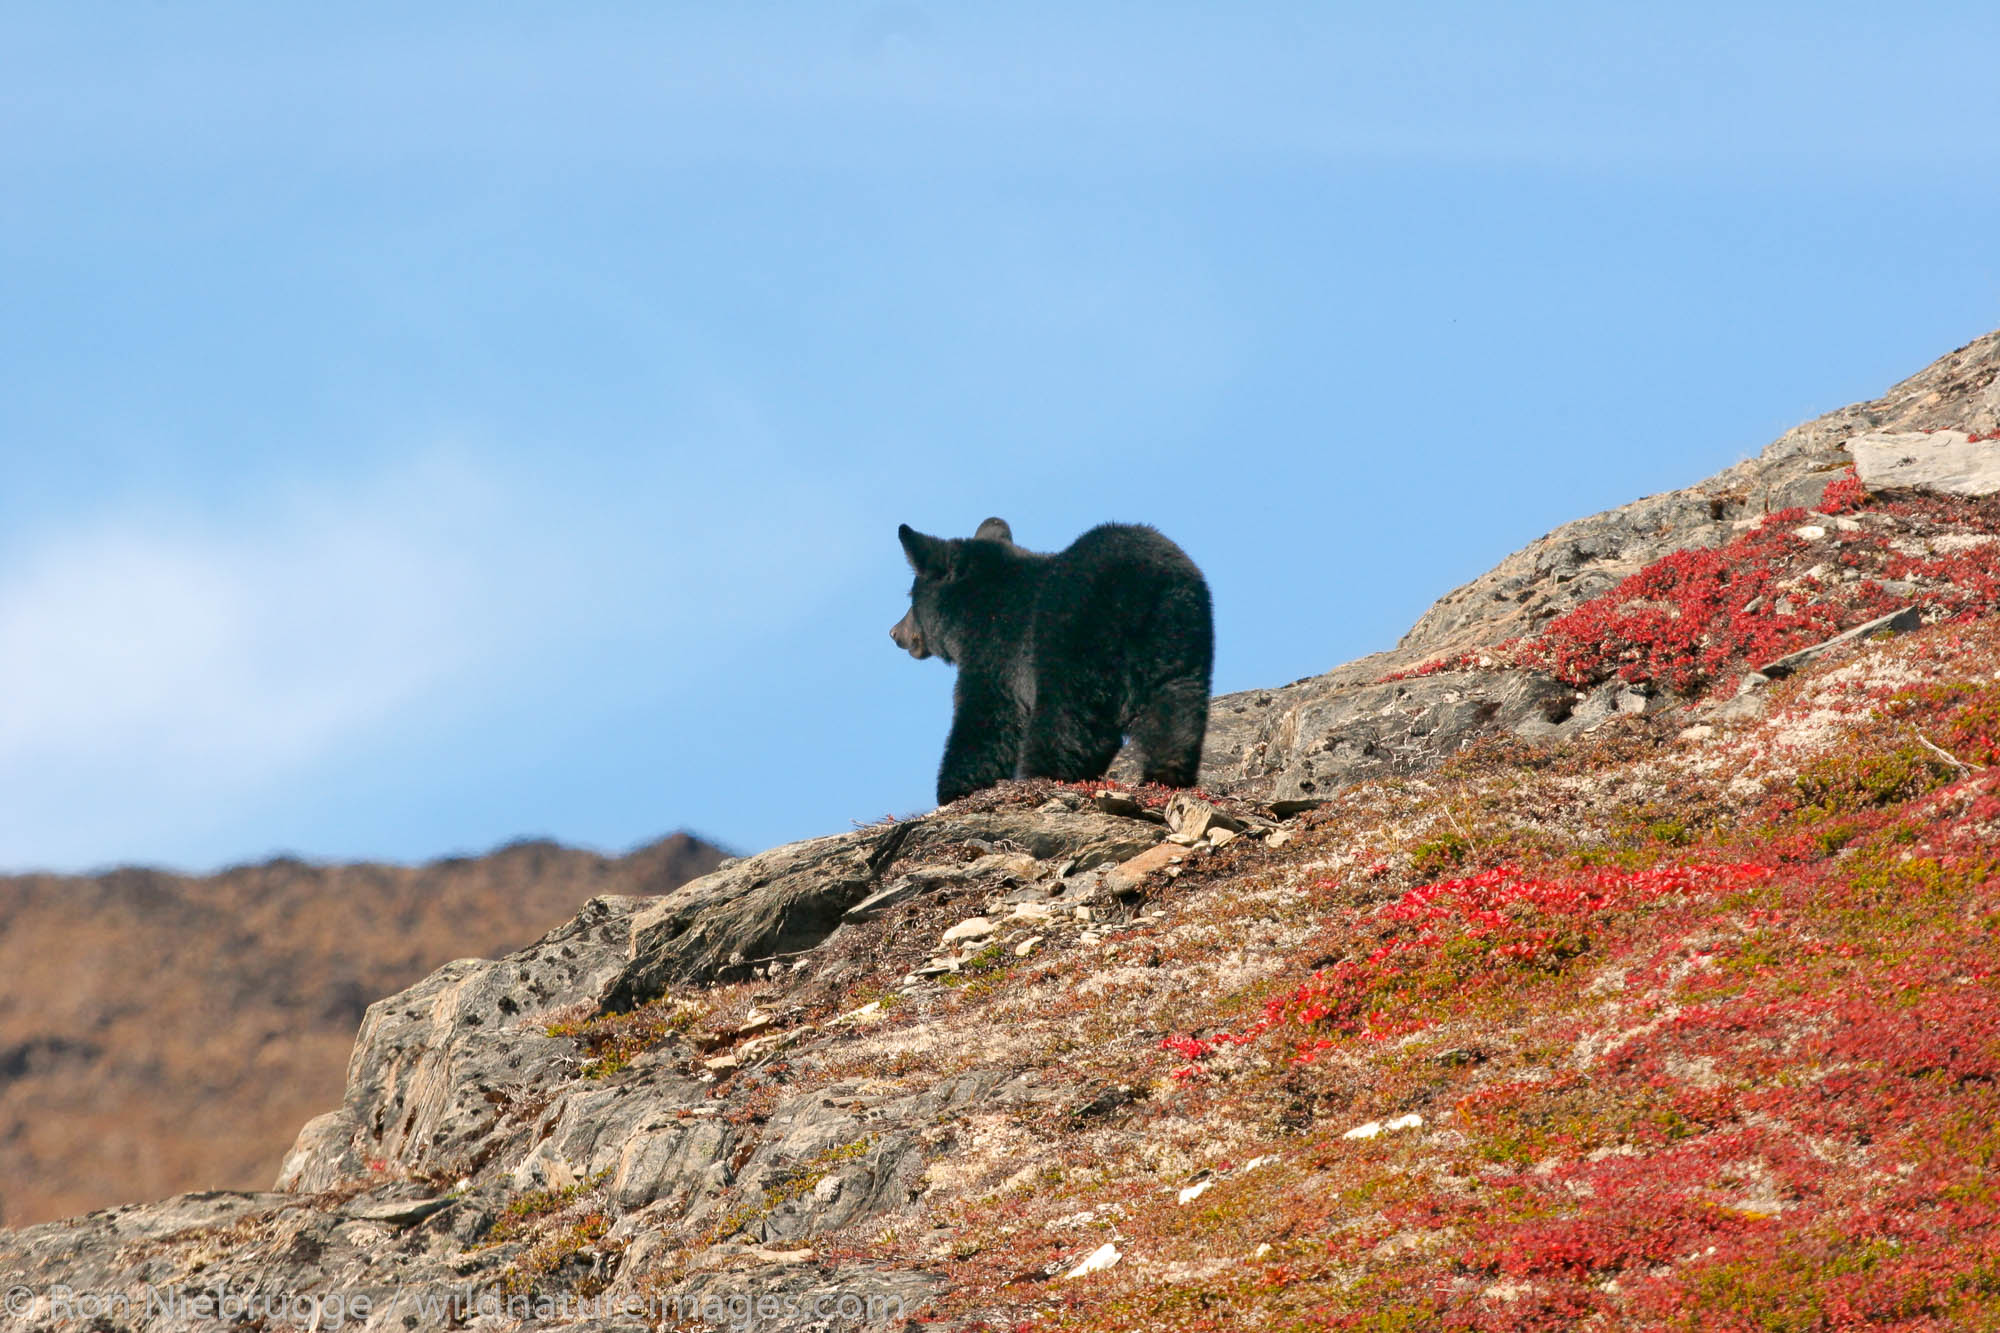 Black bear along the Harding Icefield Trail near Exit Glacier, Kenai Fjords National Park, Alaska.